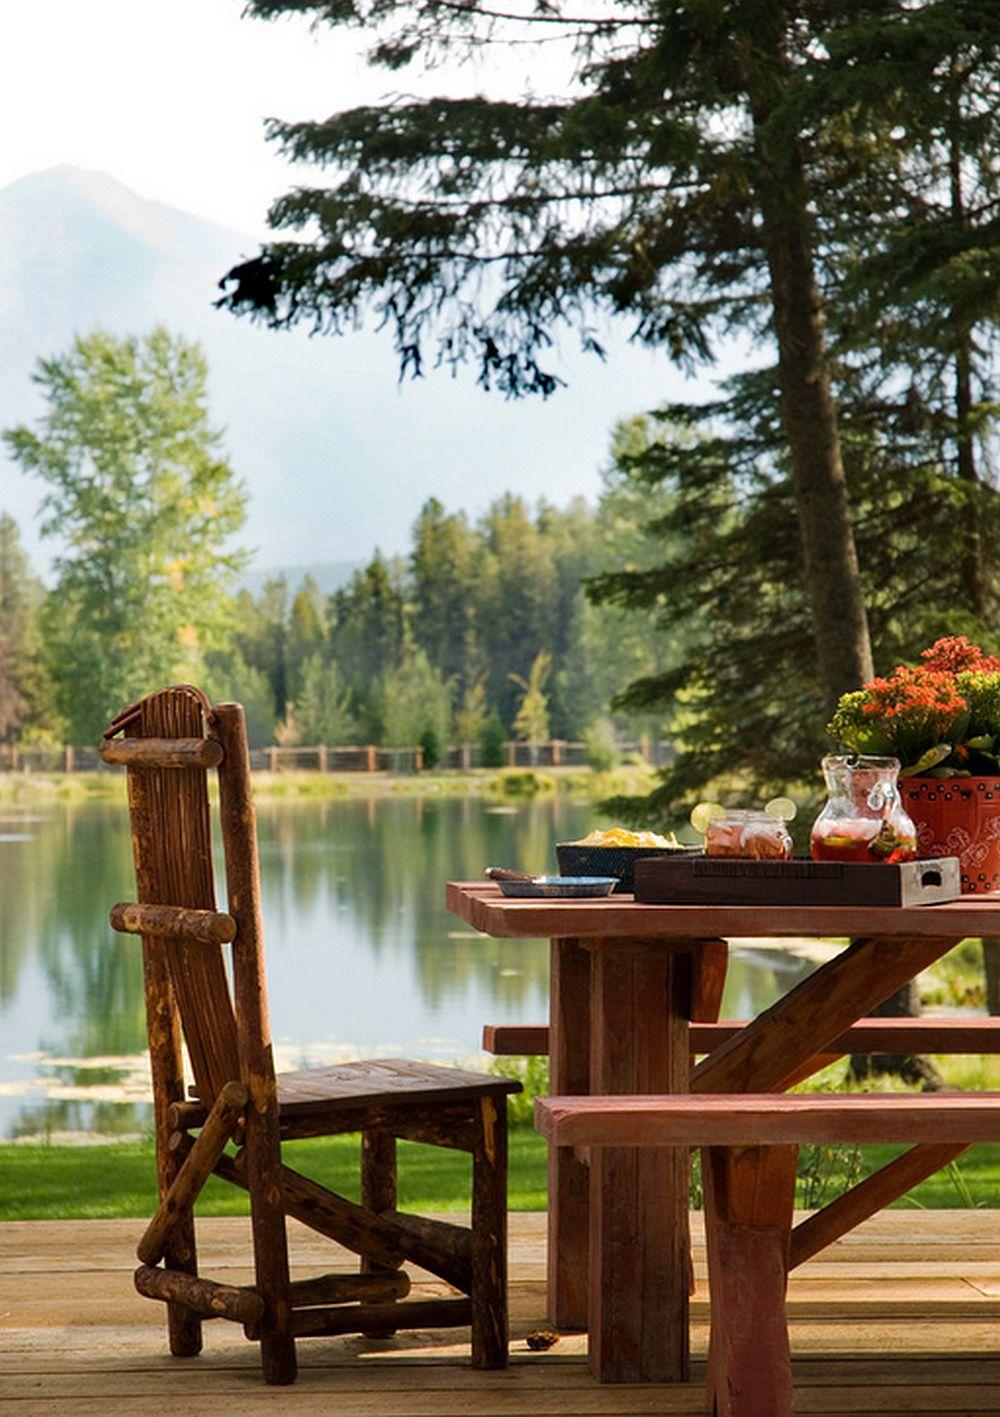 adelaparvu.com despre cabana din lemn vechi recuperat, cabana Swan Valley, Montana, RMT Architects (14)